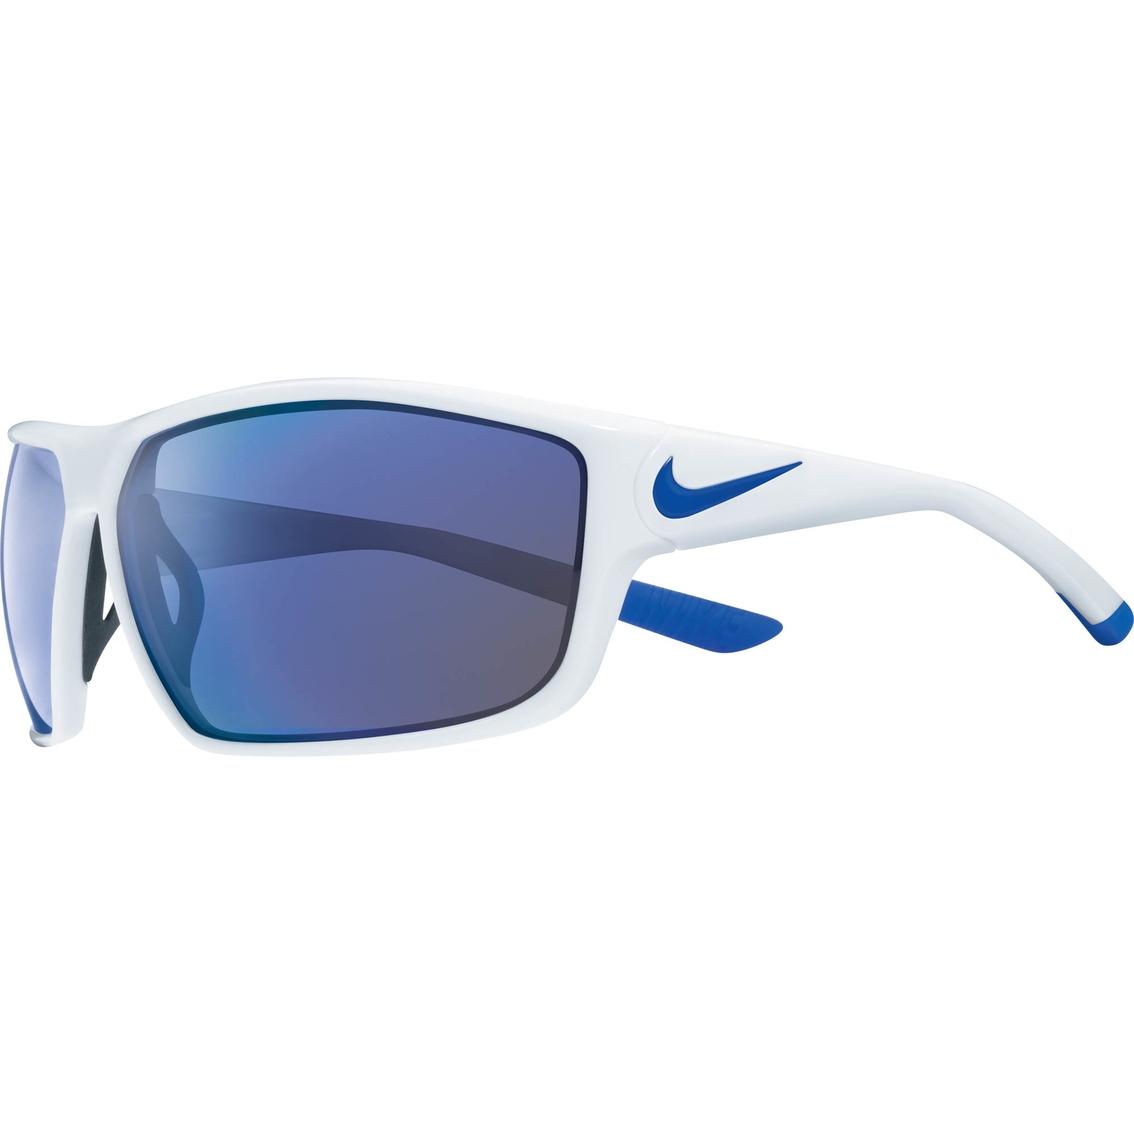 e076b140a3 Nike Ignition Plastic Square Sunglasses Ev0867